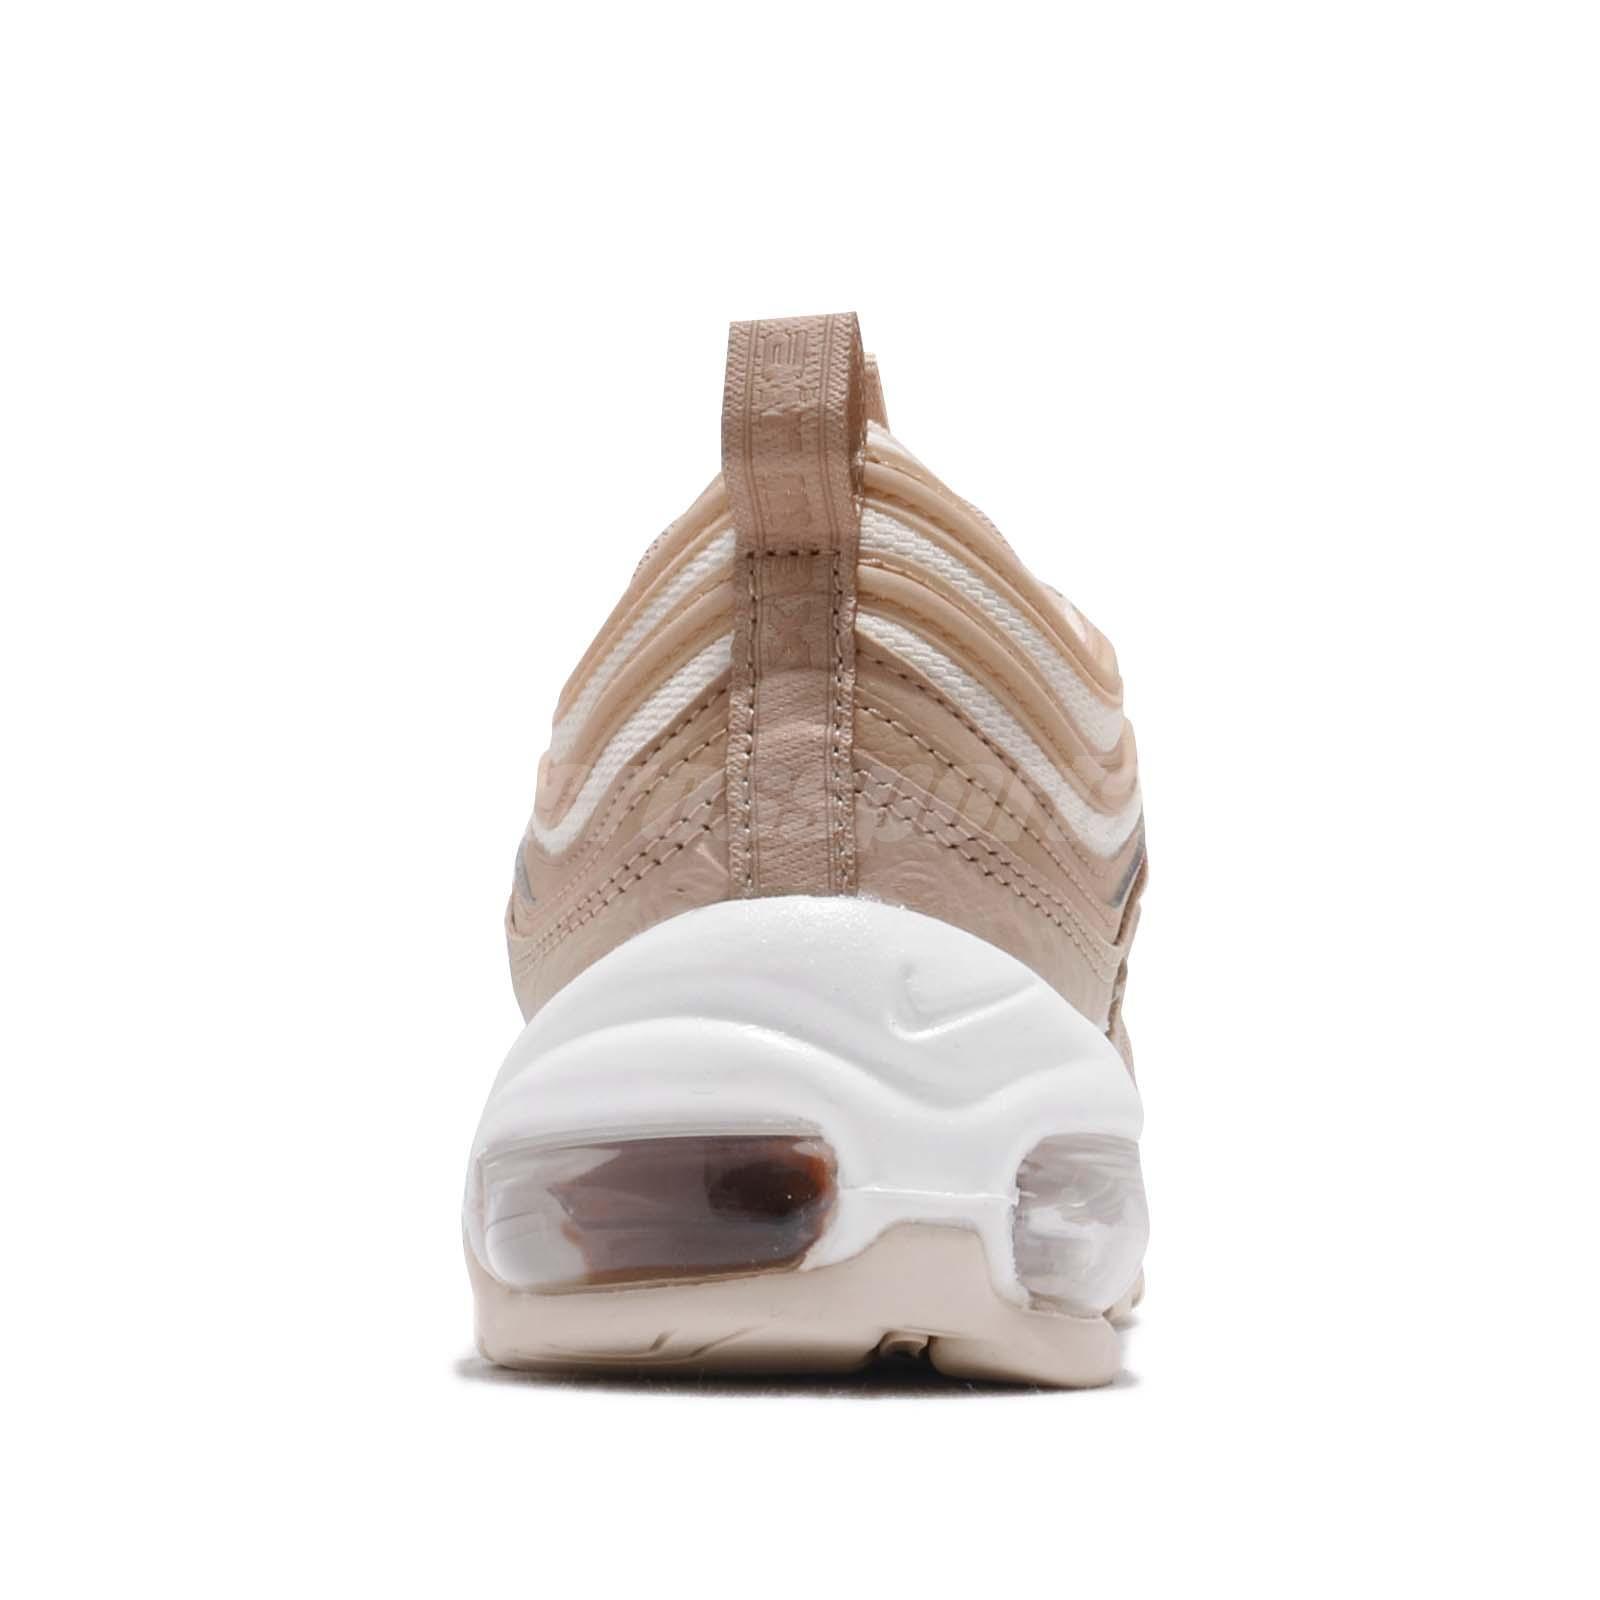 Nike Wmns Air Max 97 LX Bio Beige Womens Running Shoes NSW